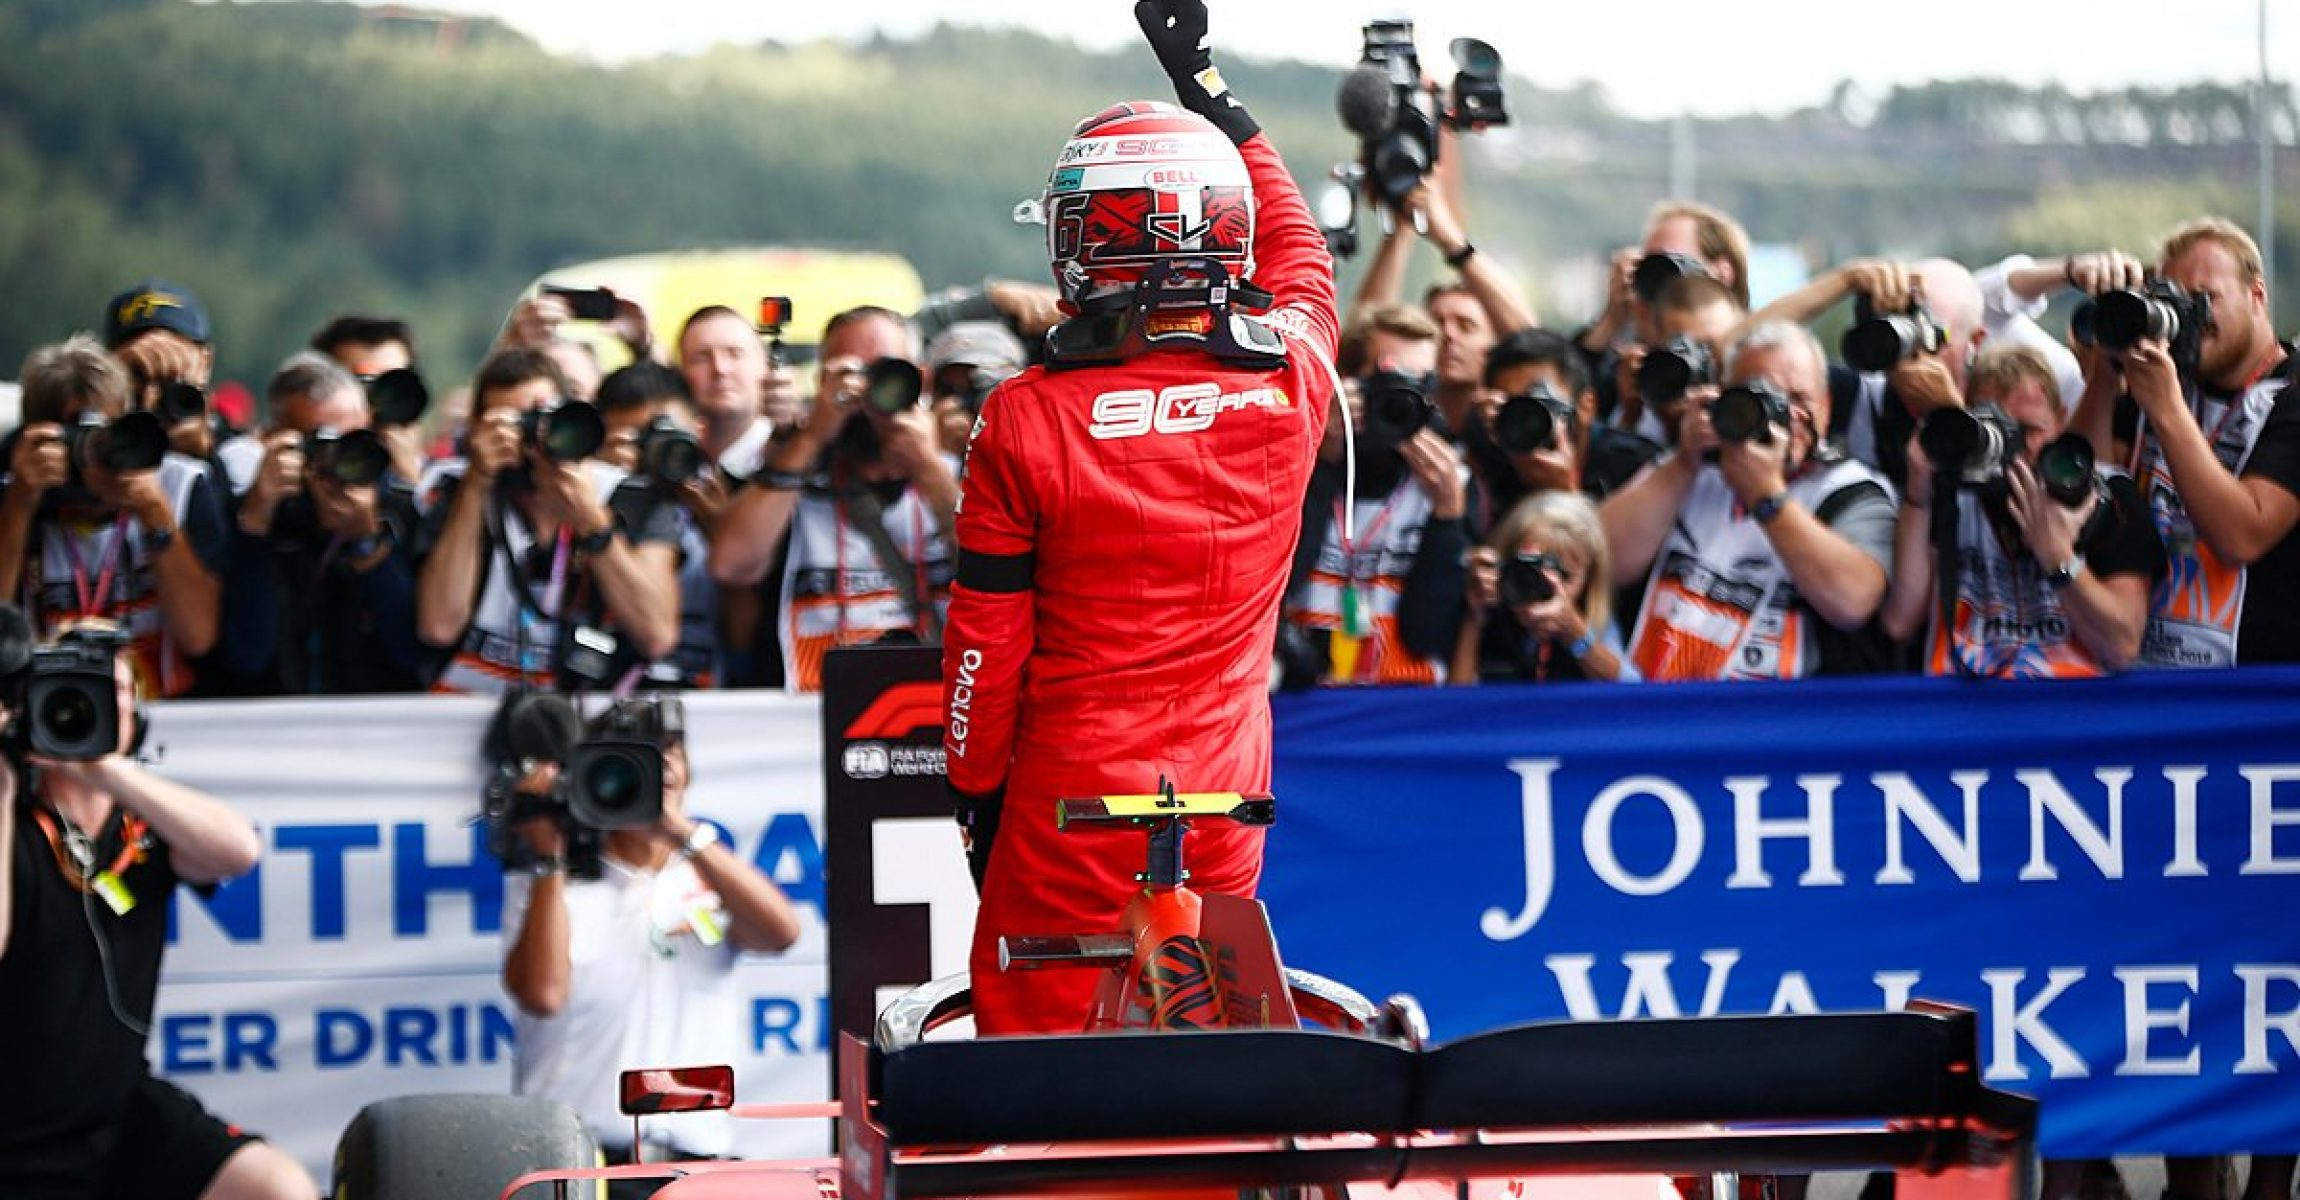 Charles Leclerc's first win with Ferrari, Belgian Grand Prix 2019,